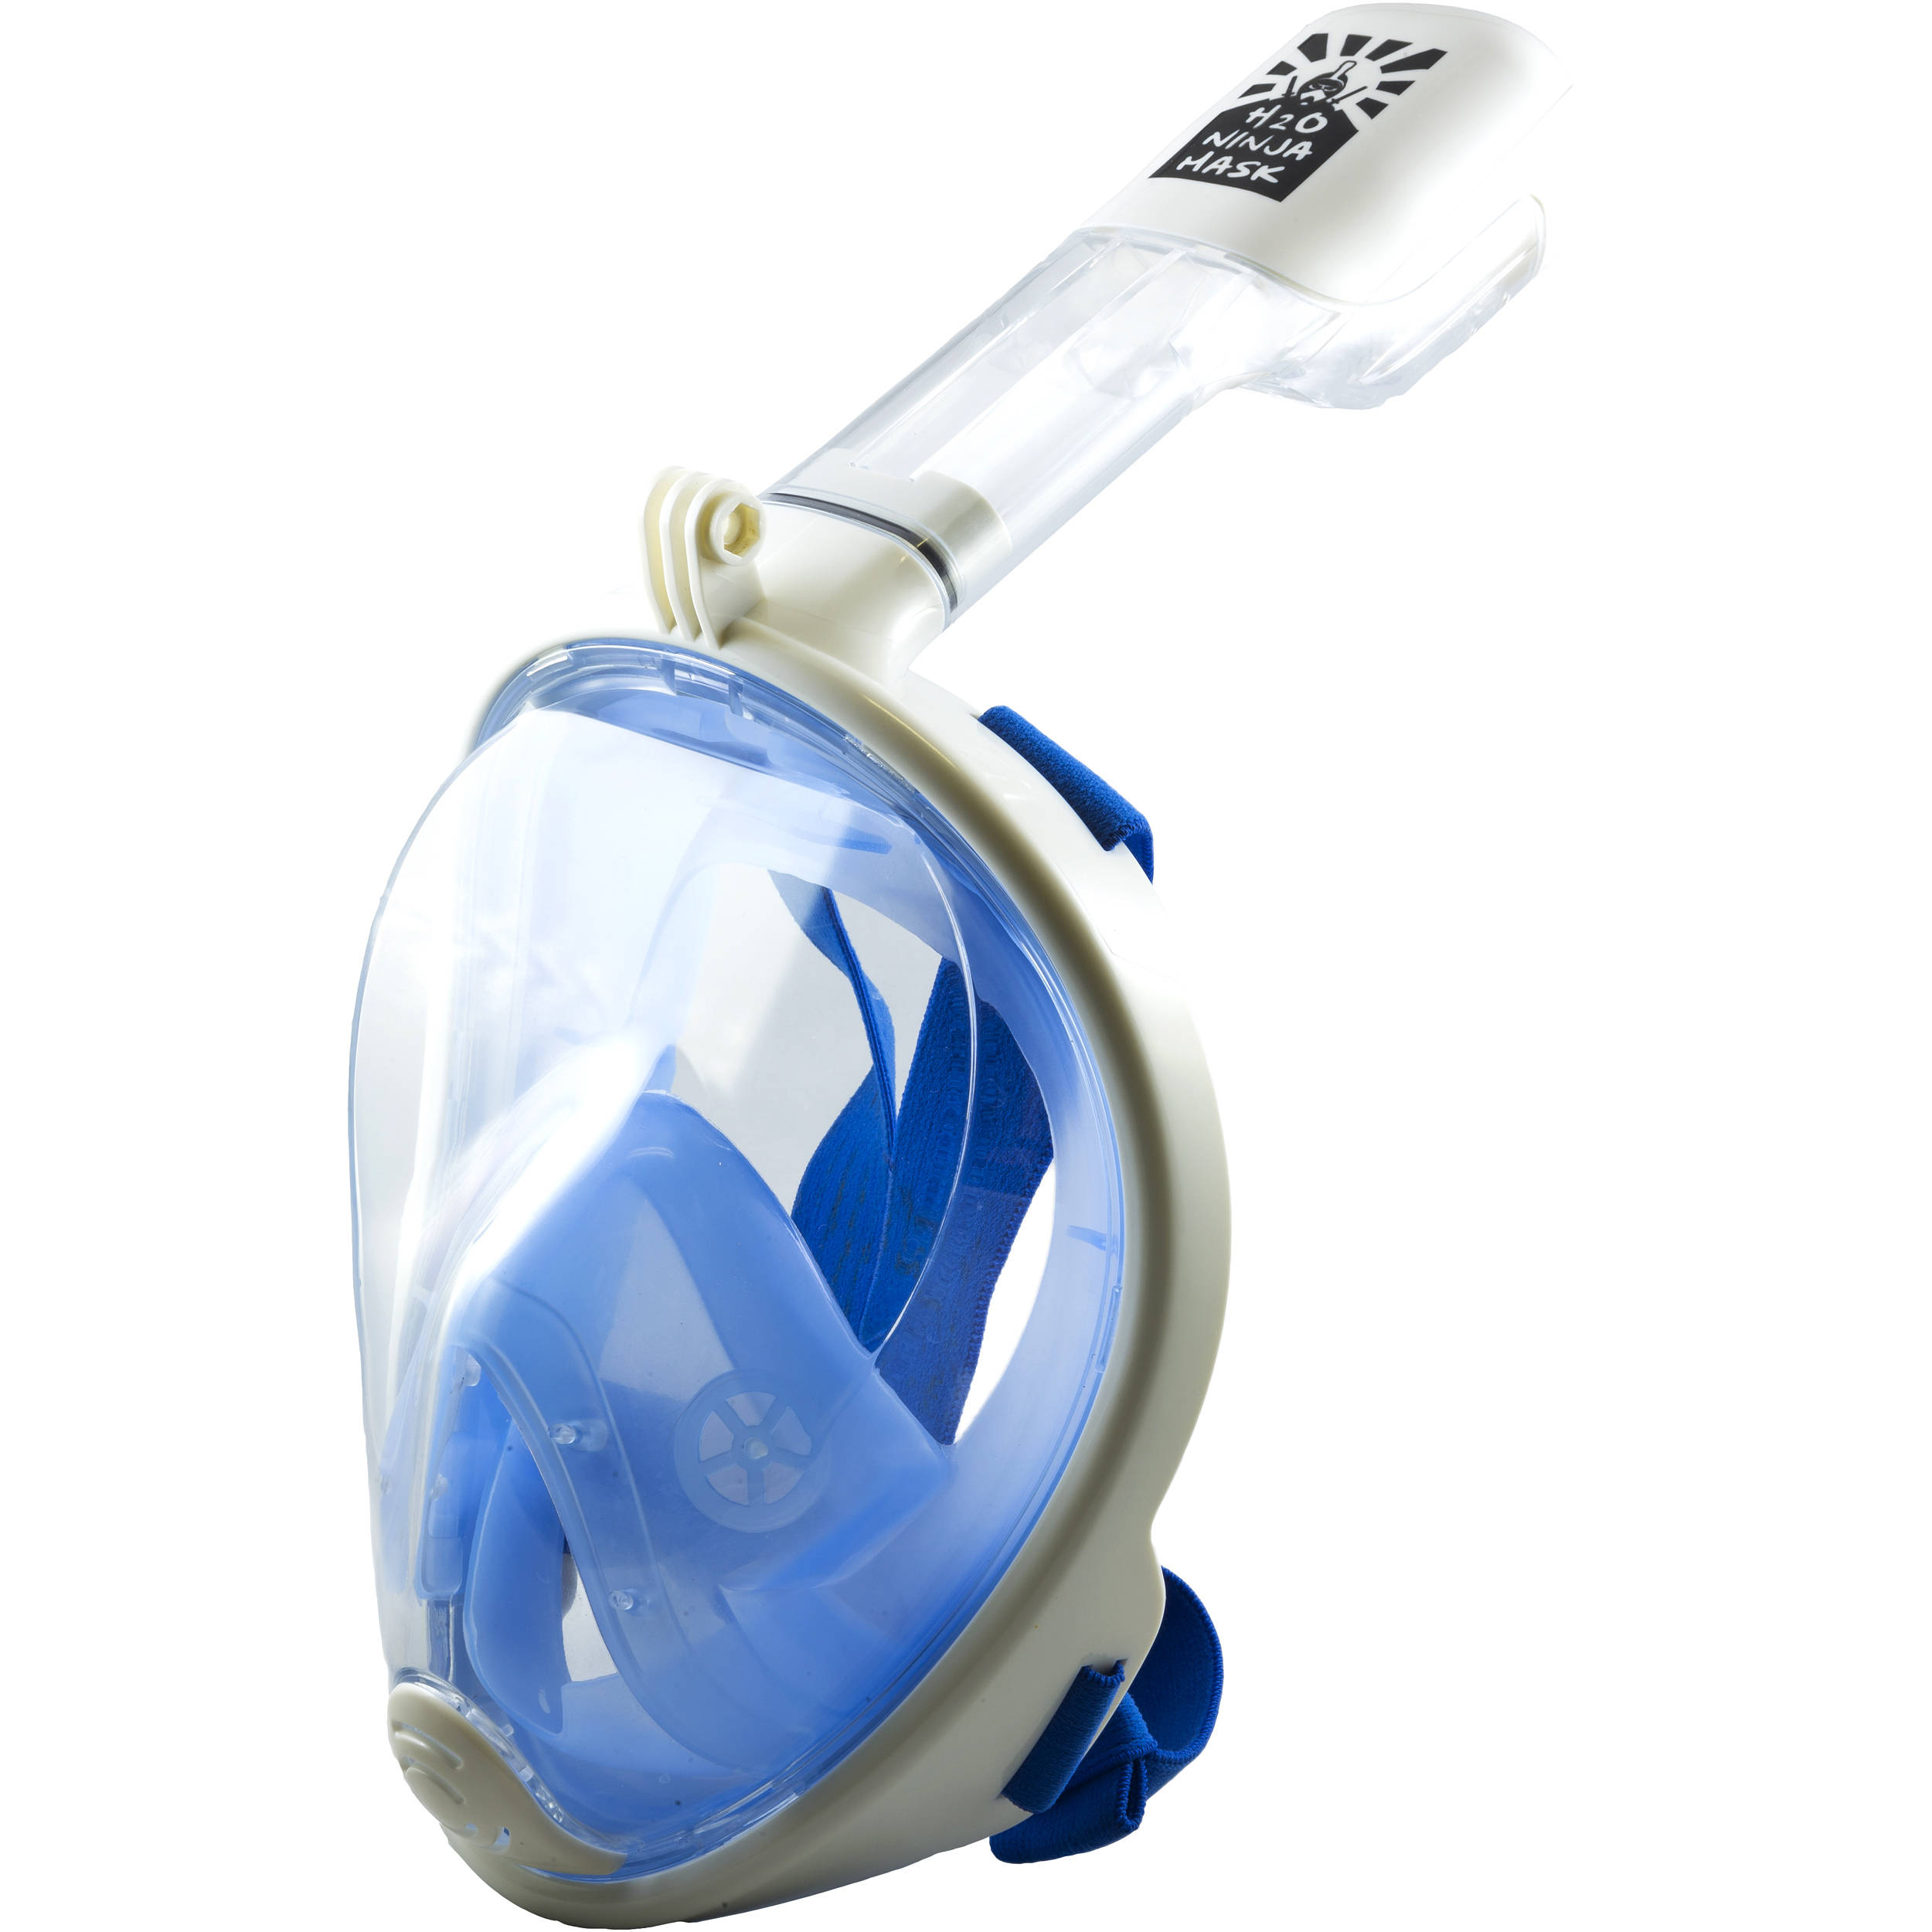 cc246ccd220c H2O Ninja Full Face Snorkeling Mask GoPro Edition BLUE GOPRO S M